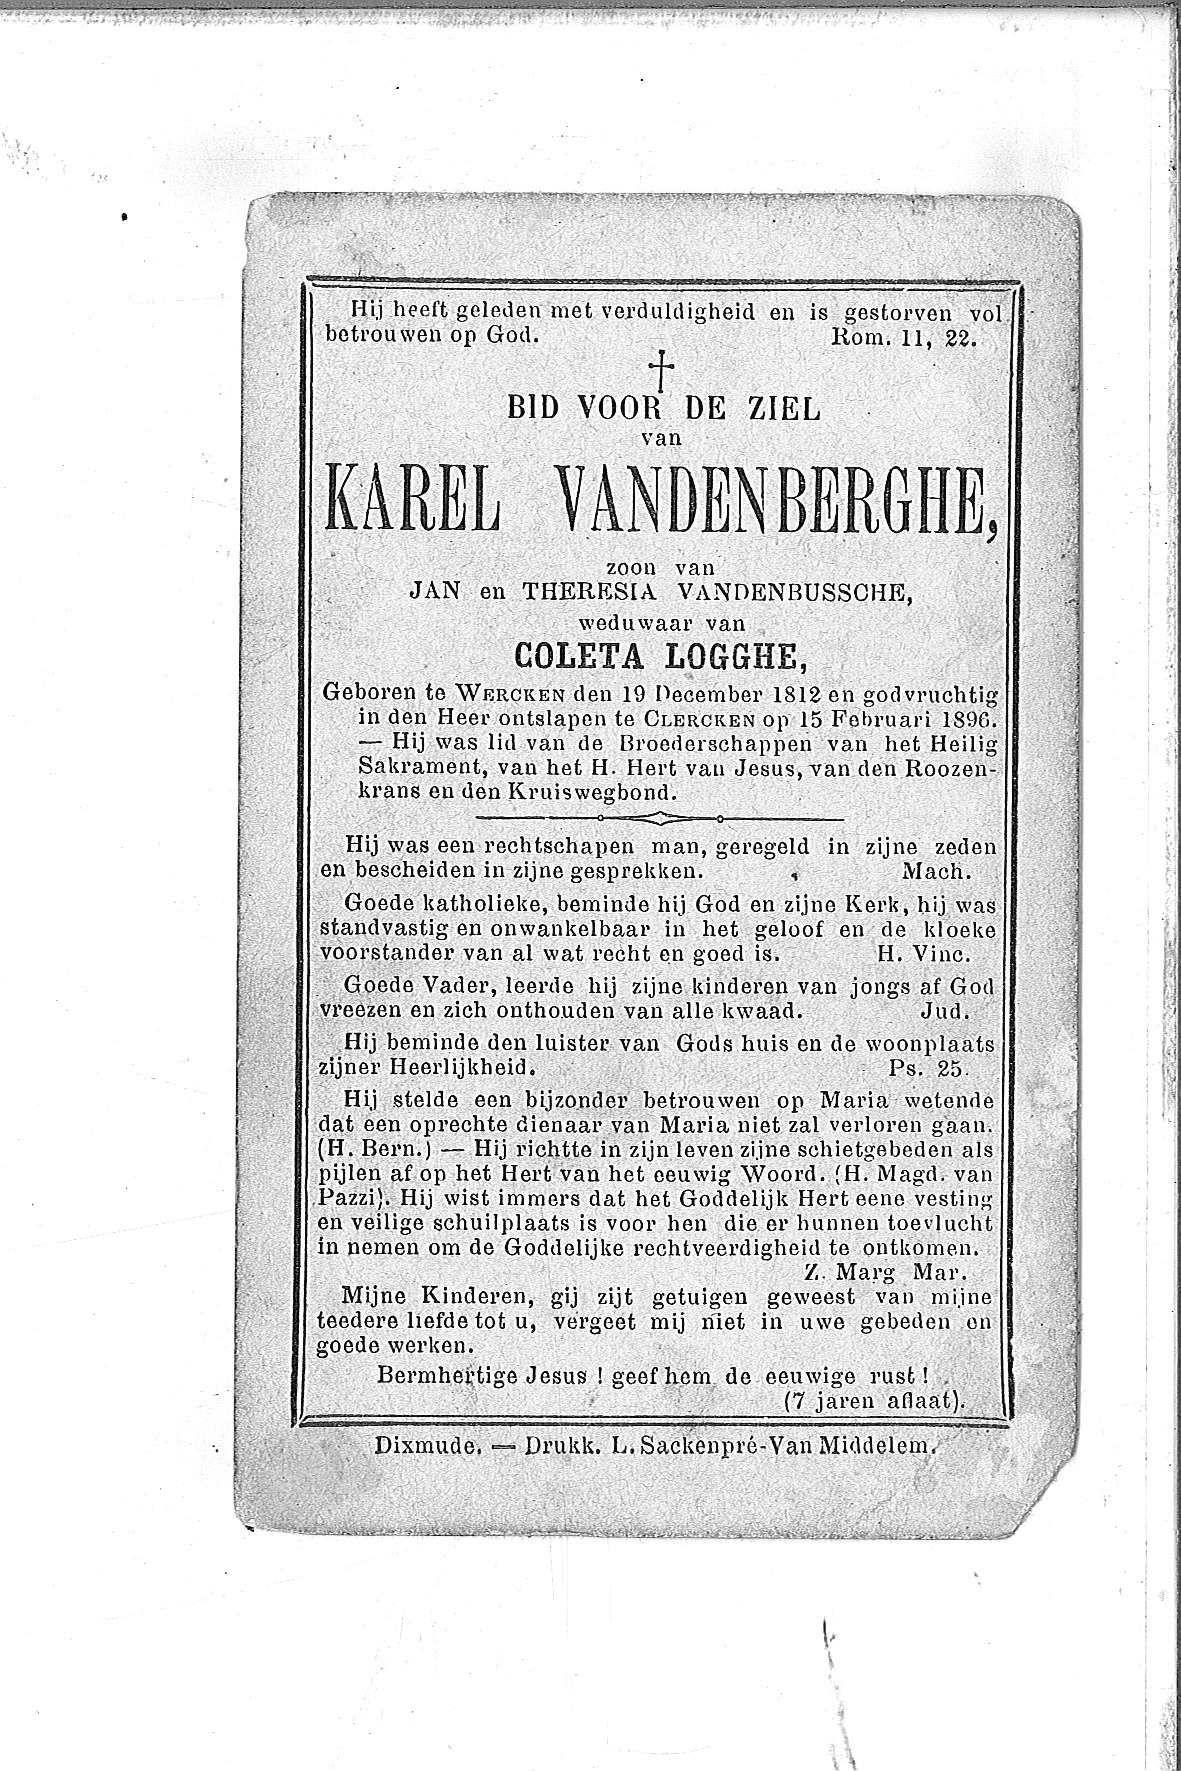 Karel(1896)20140716095549_00024.jpg